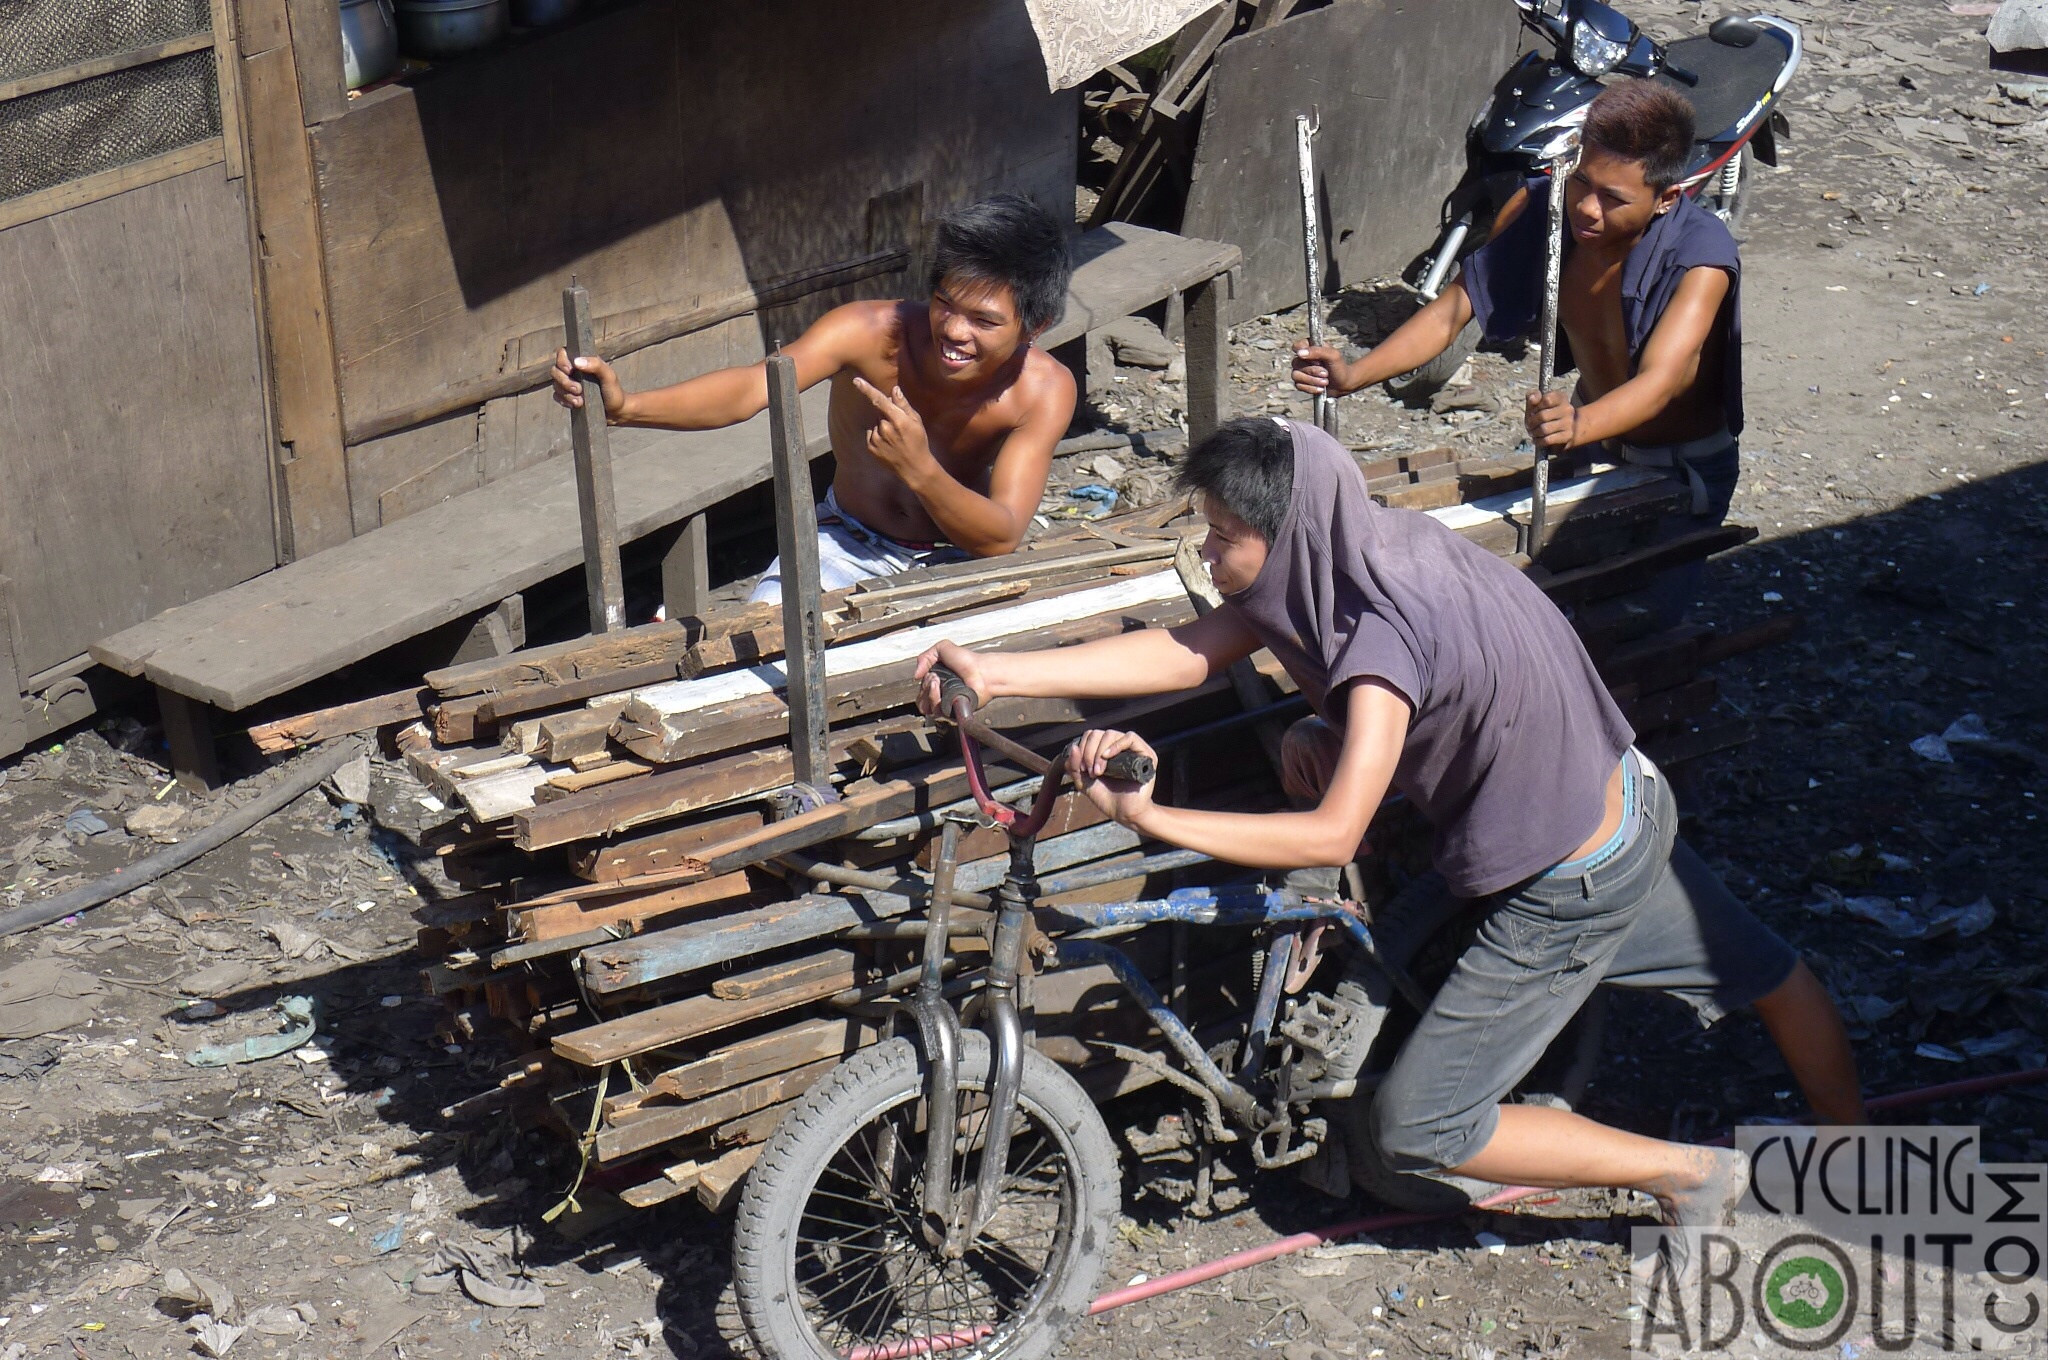 Alleykat_disaster relief in the philippines